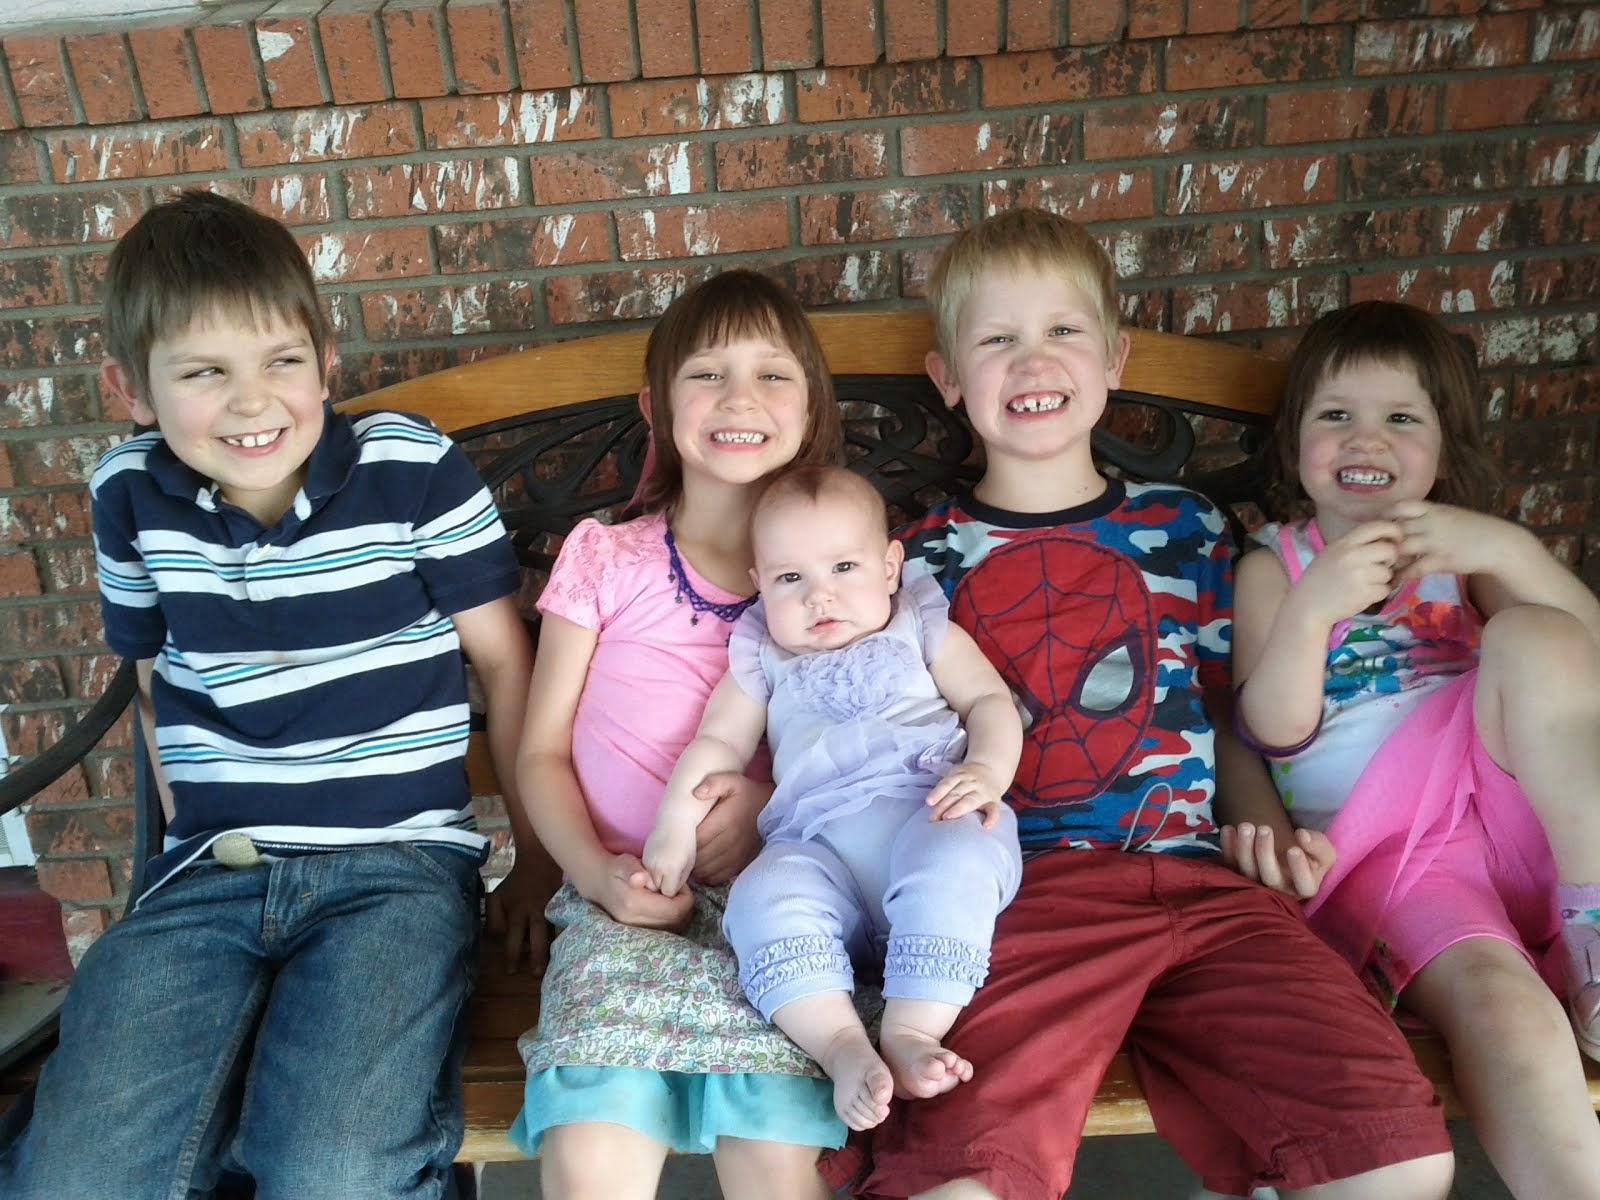 Joseph, Gabriella, Julianna, James, and Elora